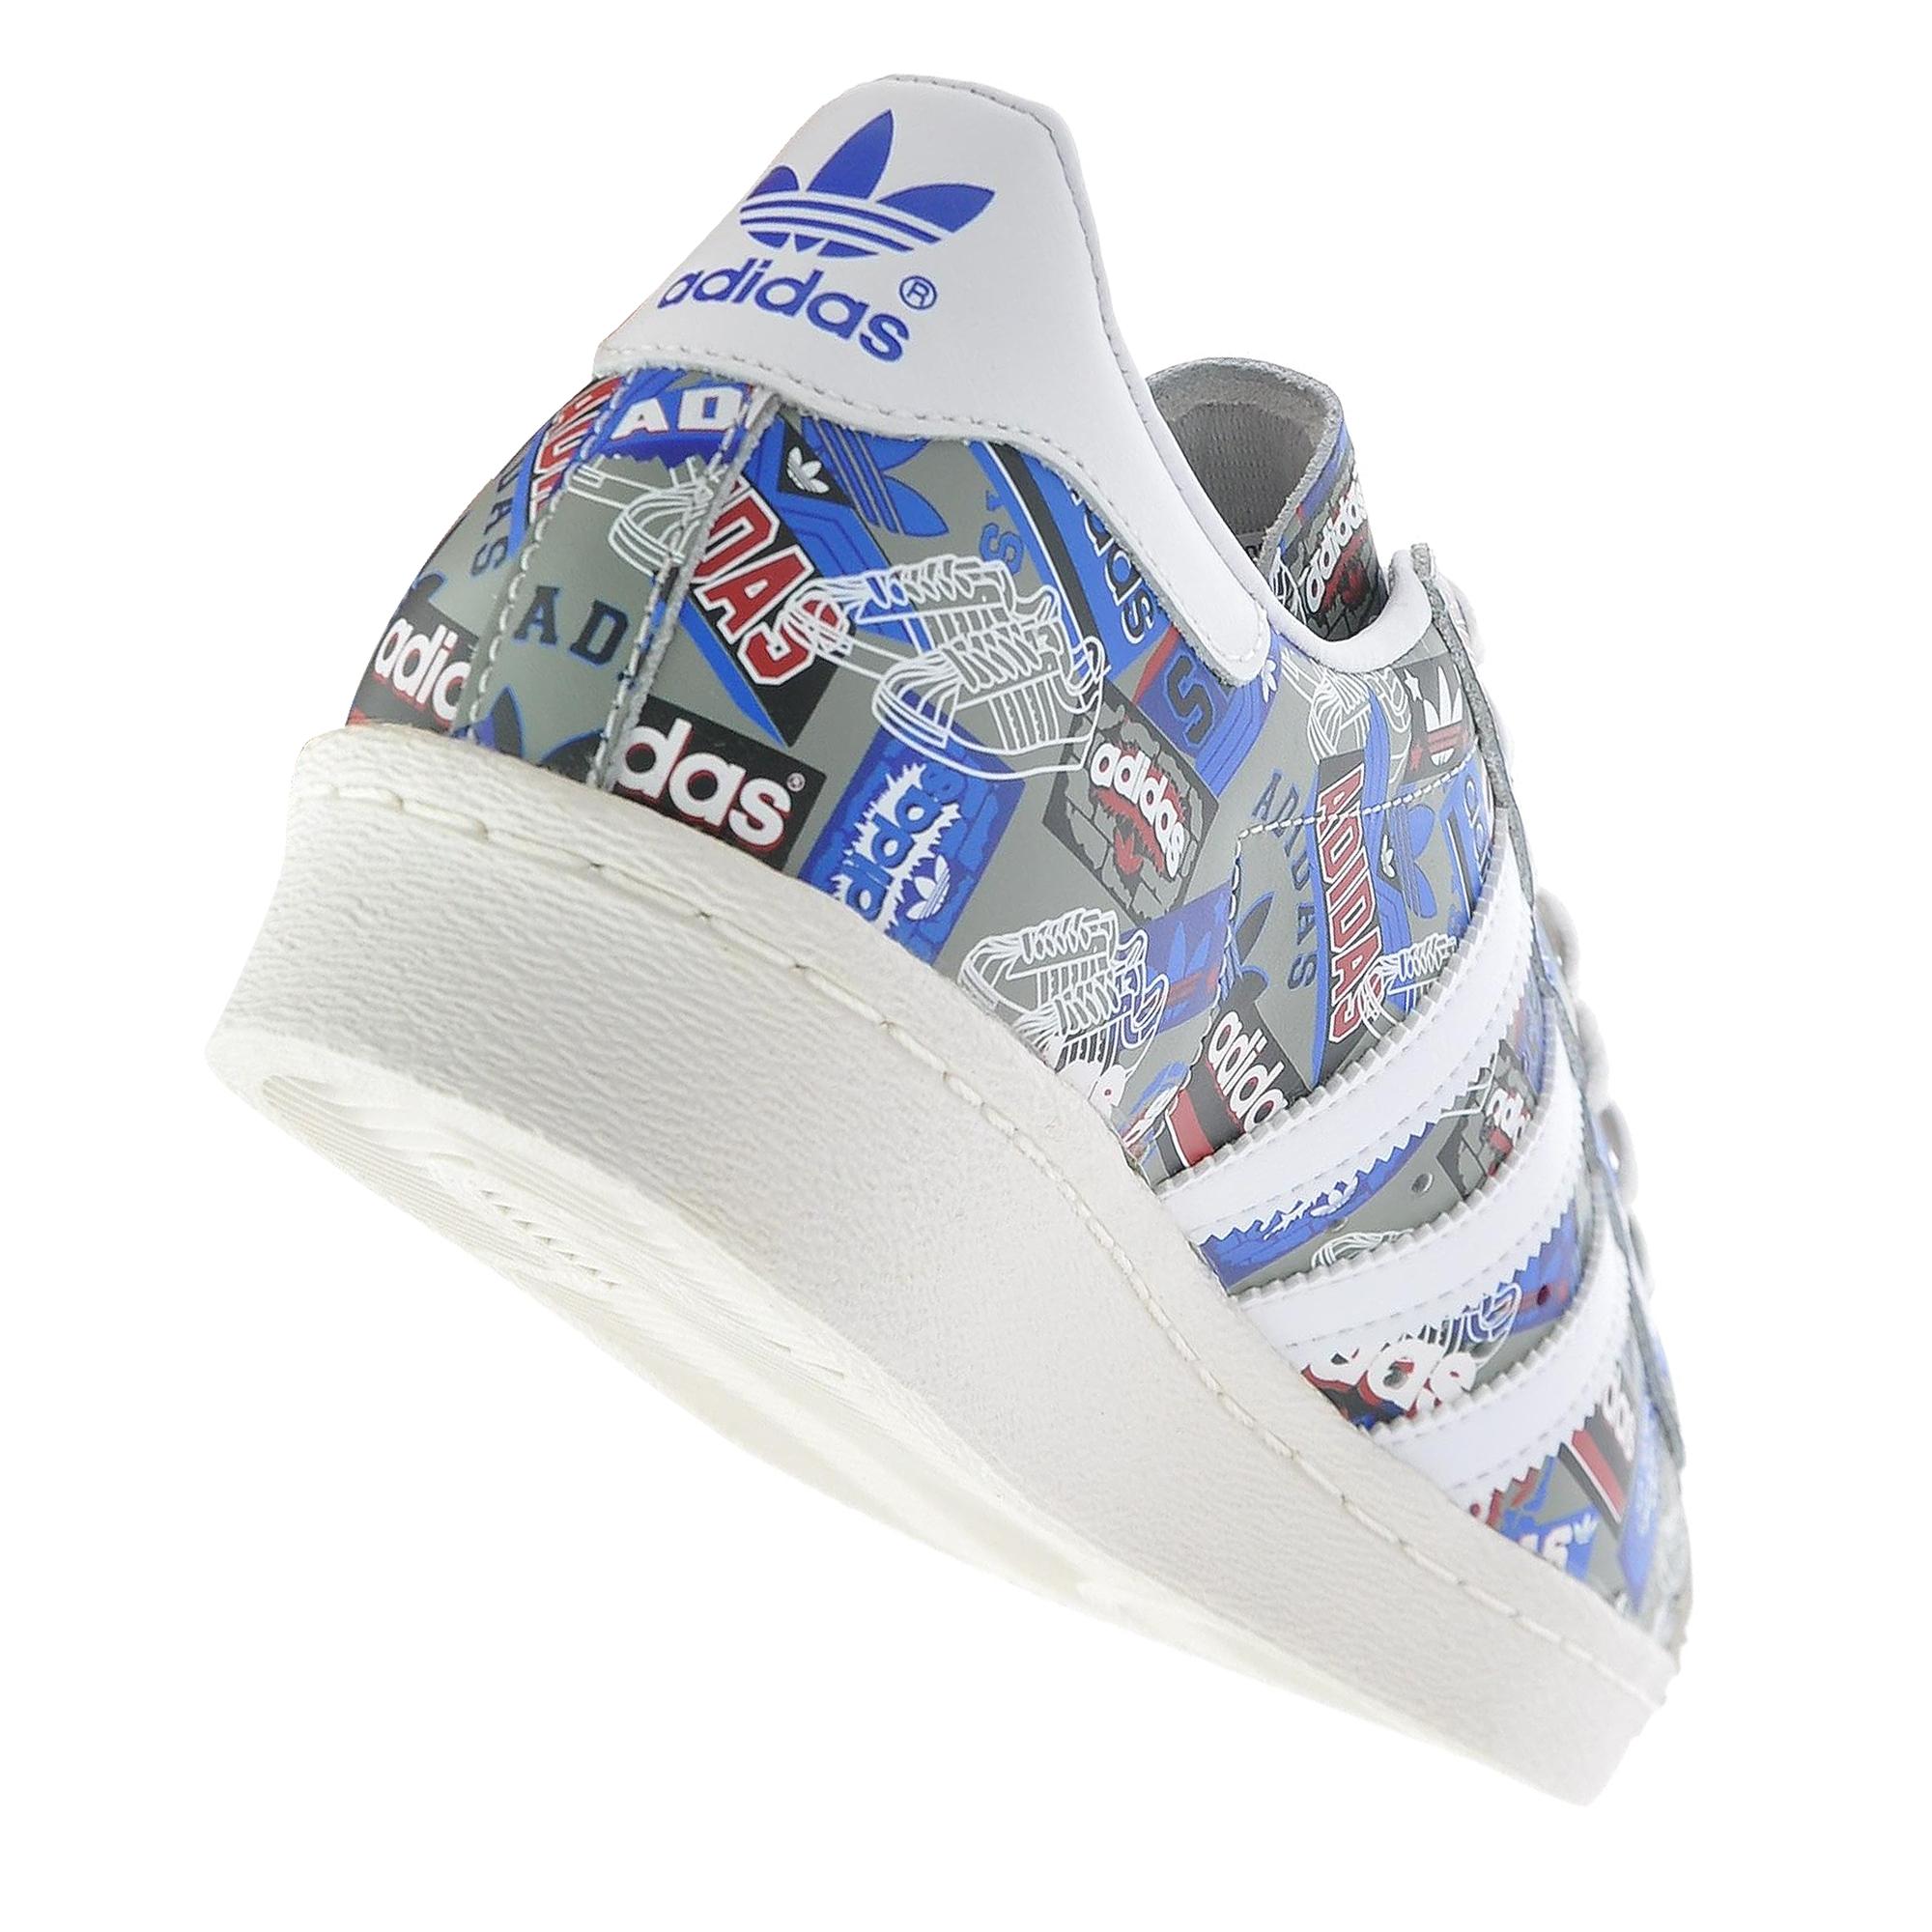 buy popular 04640 3373b adidas Superstar 80s Pioneers Nigo Erkek Spor Ayakkabı